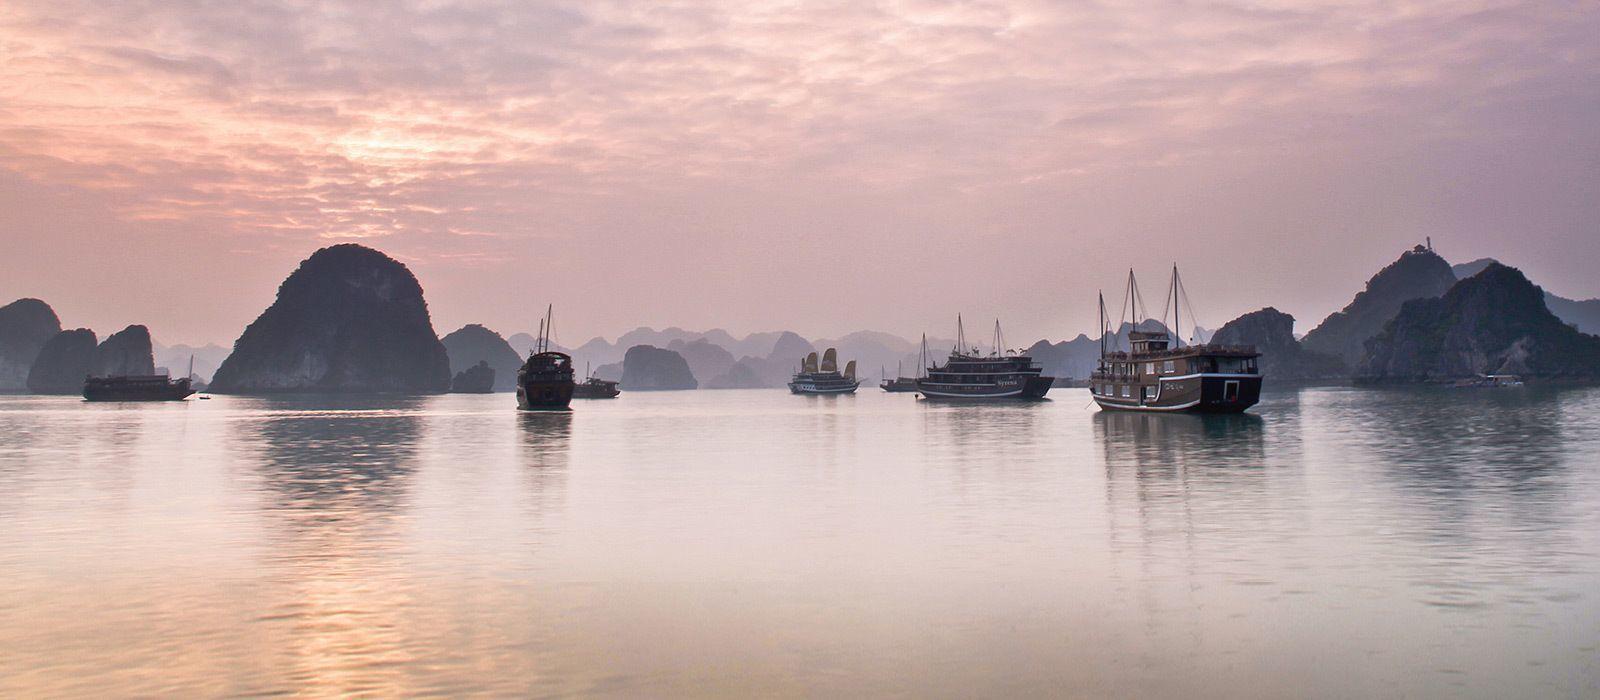 Grand of Vietnam Tour Trip 2